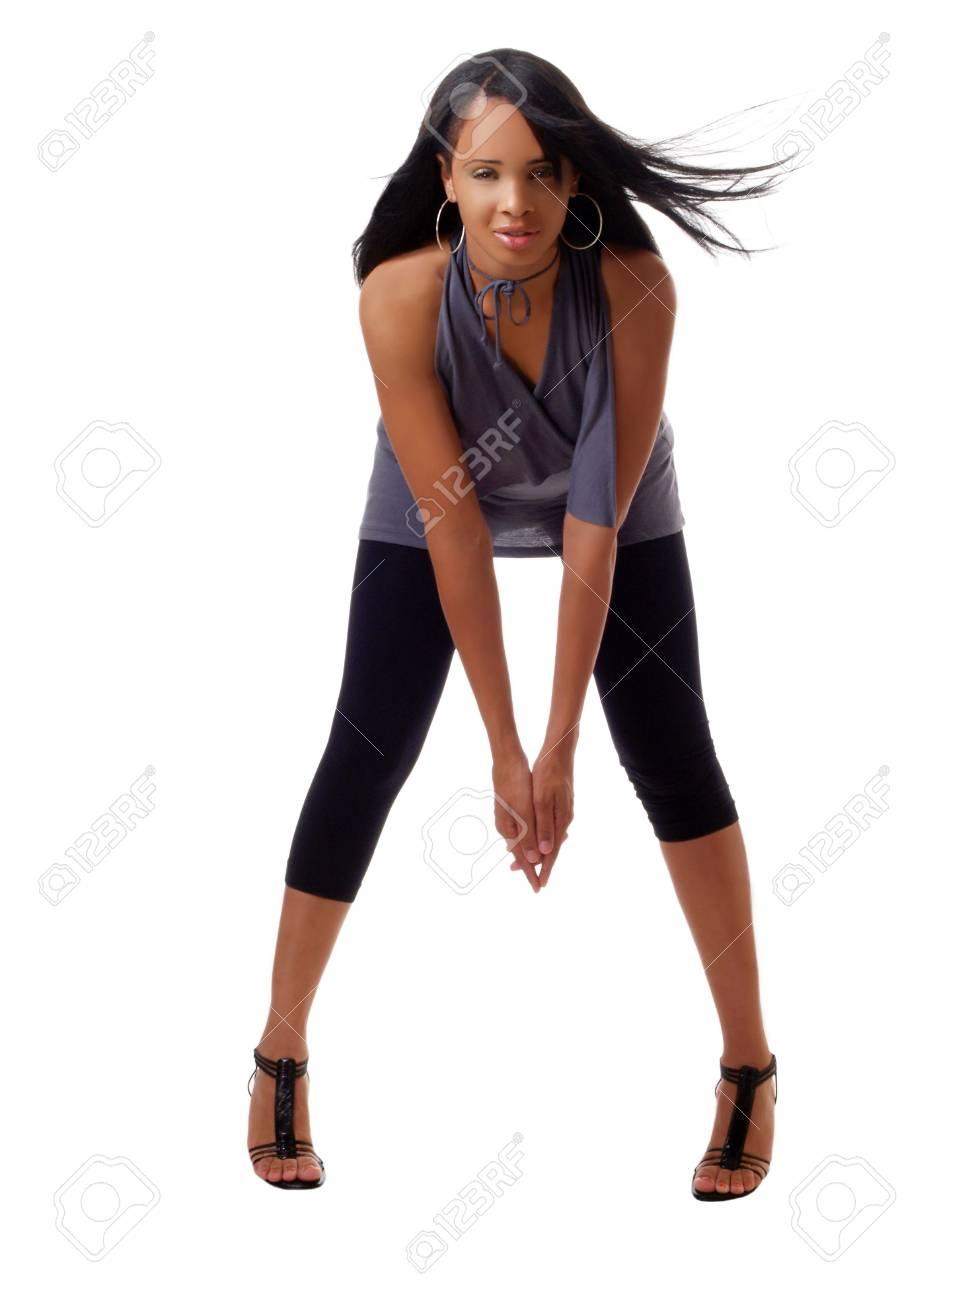 Black Women In Leggings : black, women, leggings, Young, Black, Woman, Leggings, Bending, Forward, Stock, Photo,, Picture, Royalty, Image., Image, 3348039.